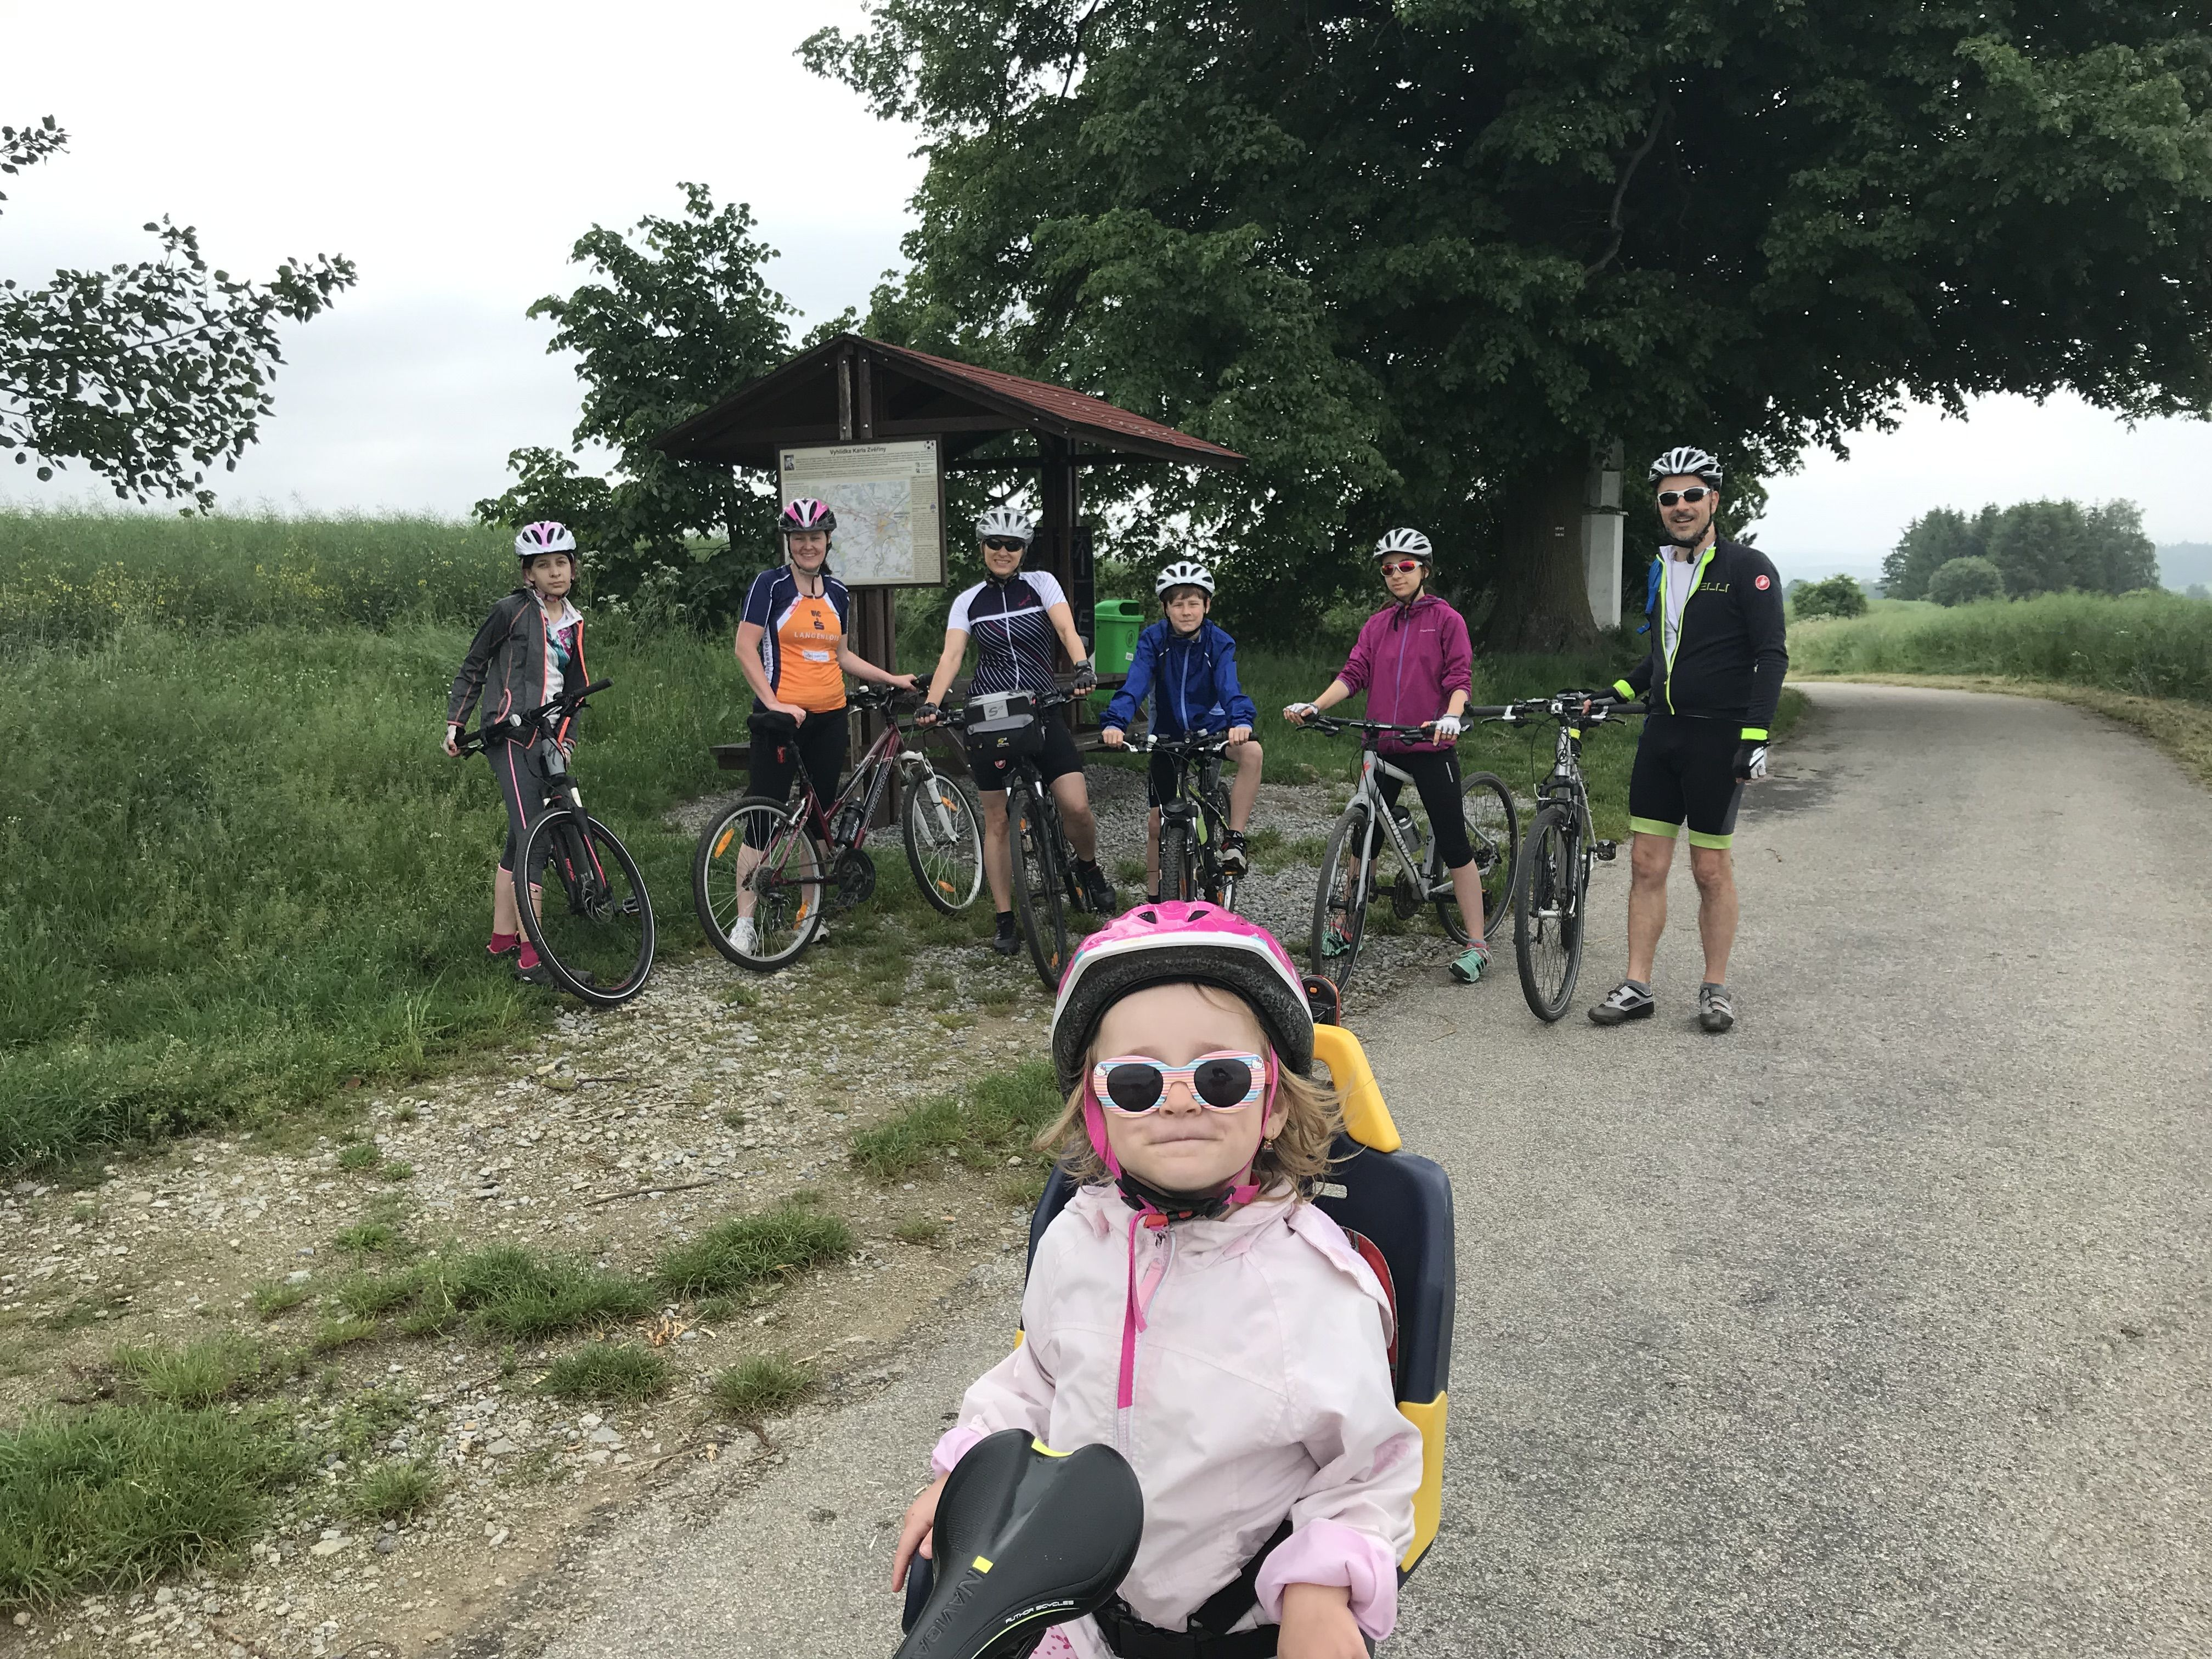 Účastníci cyklovýletu